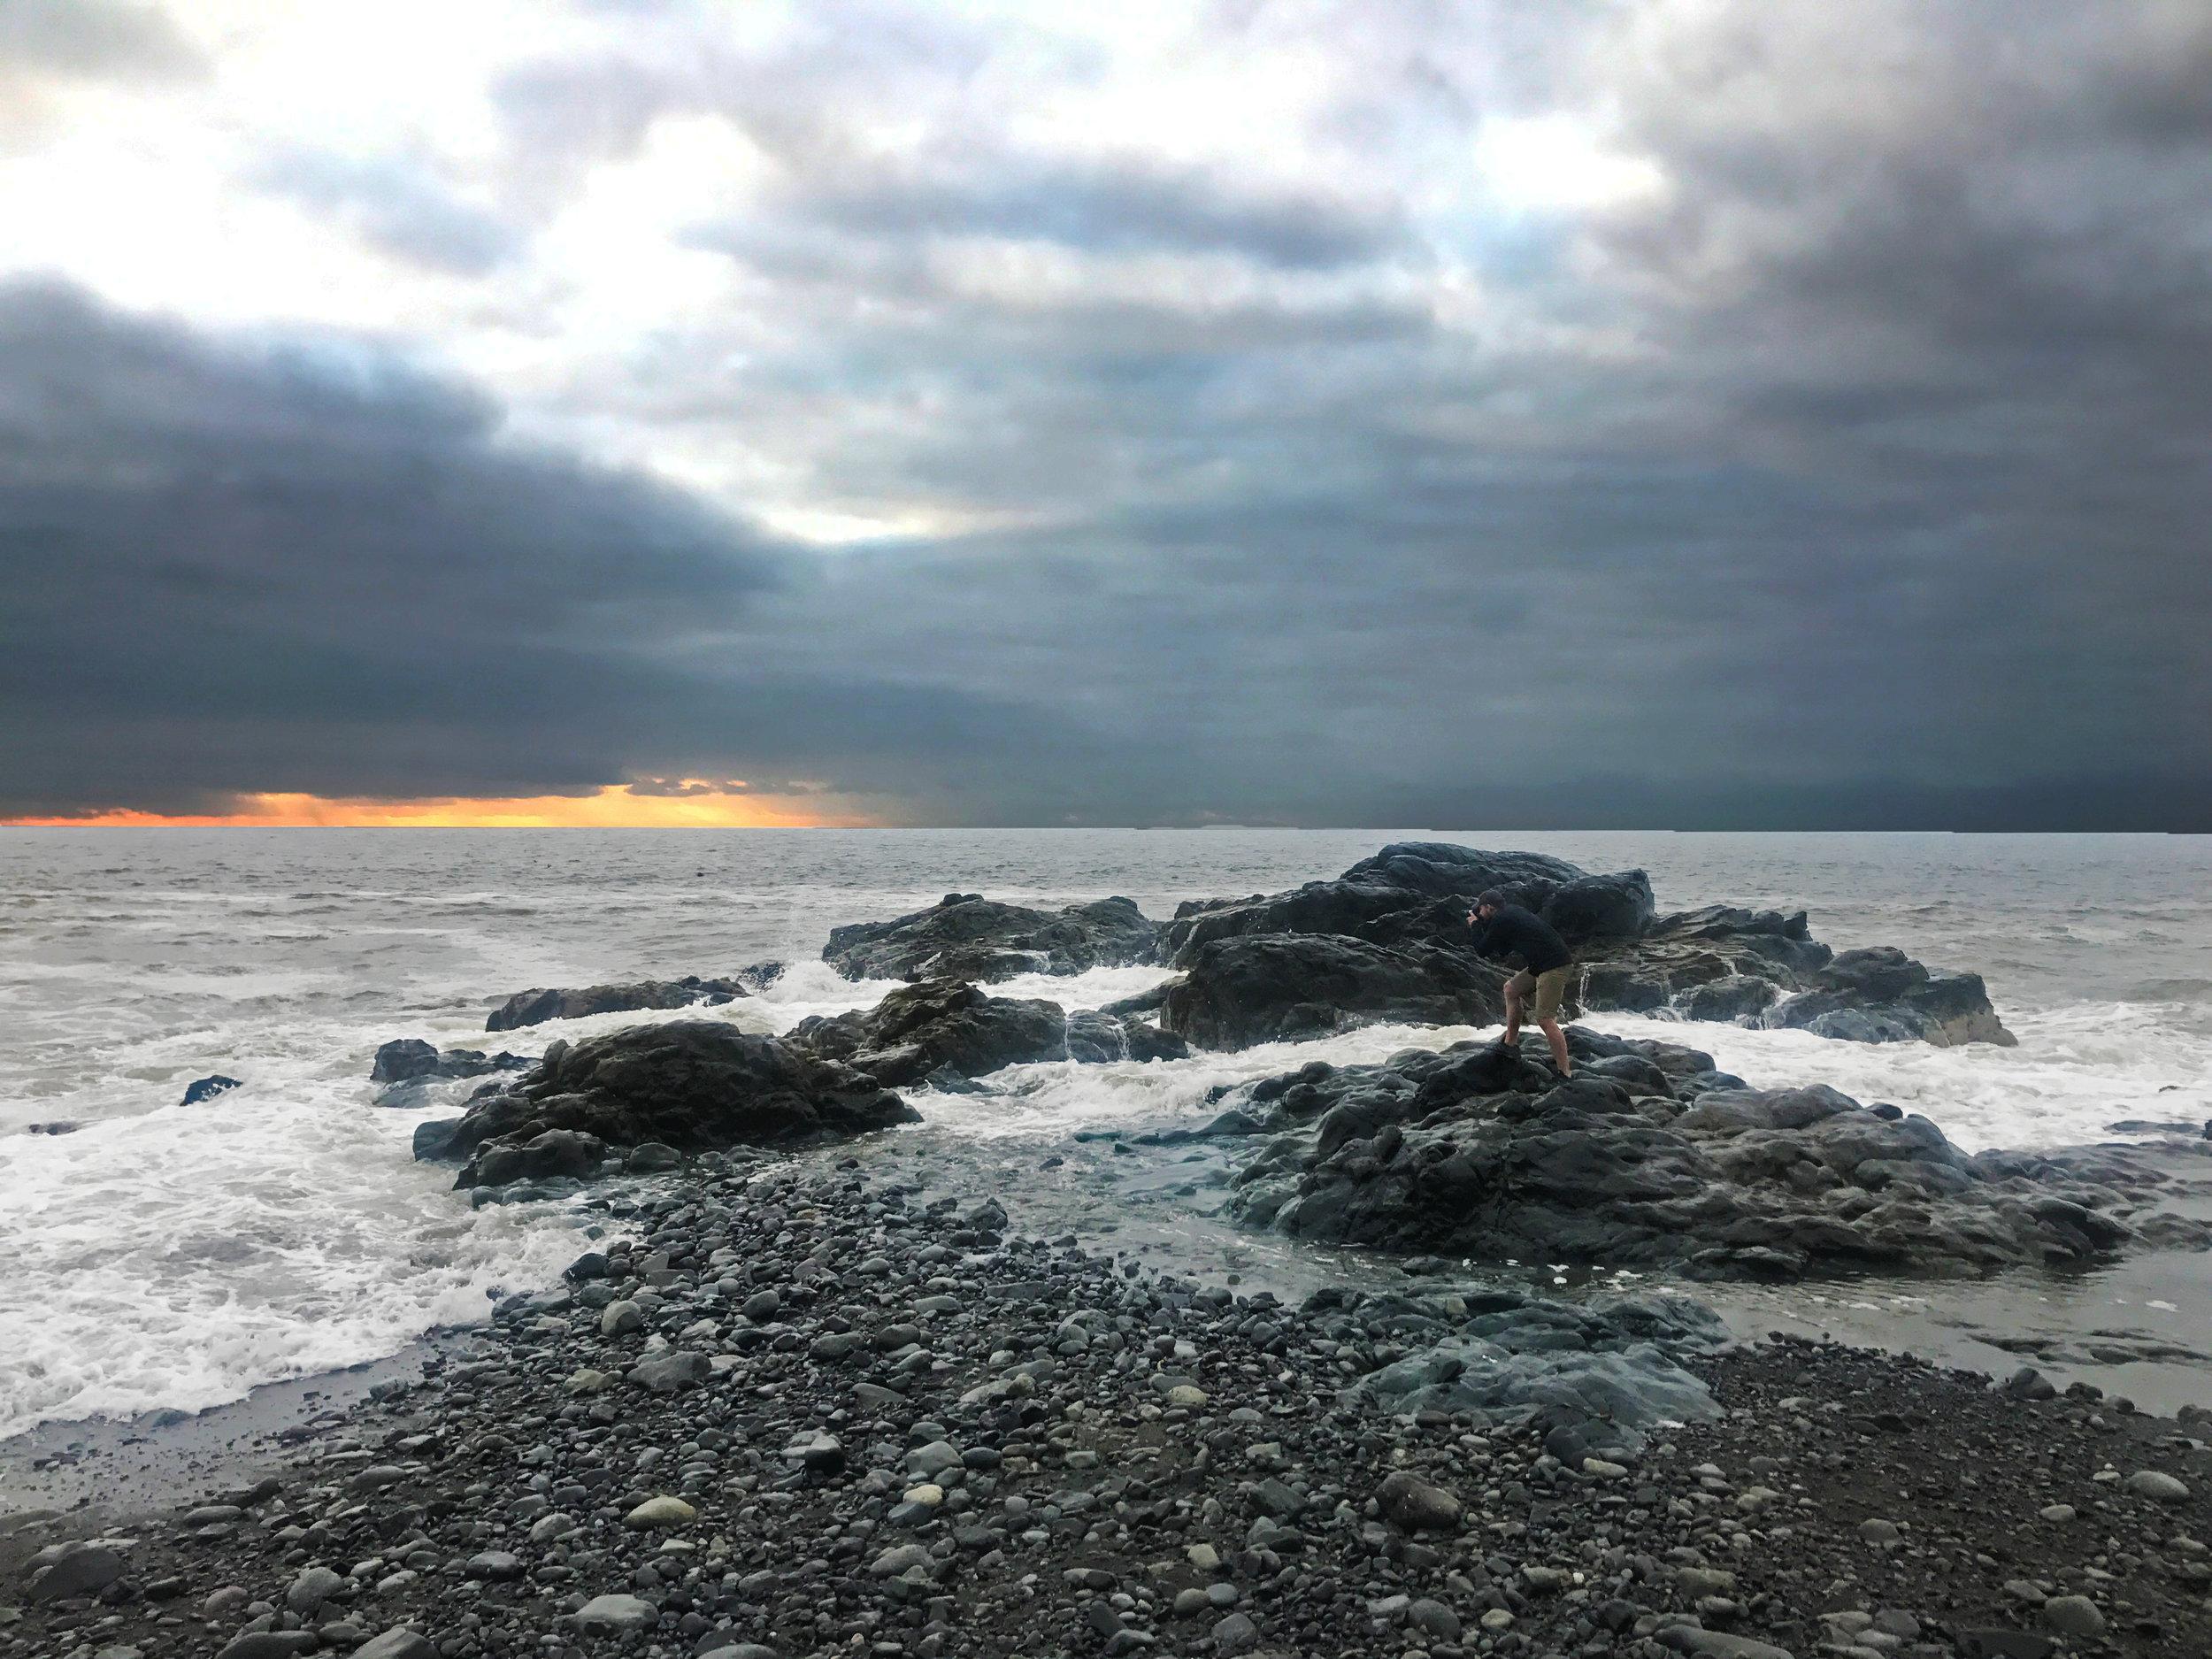 Mikal-taking-photo-of-waves.jpg